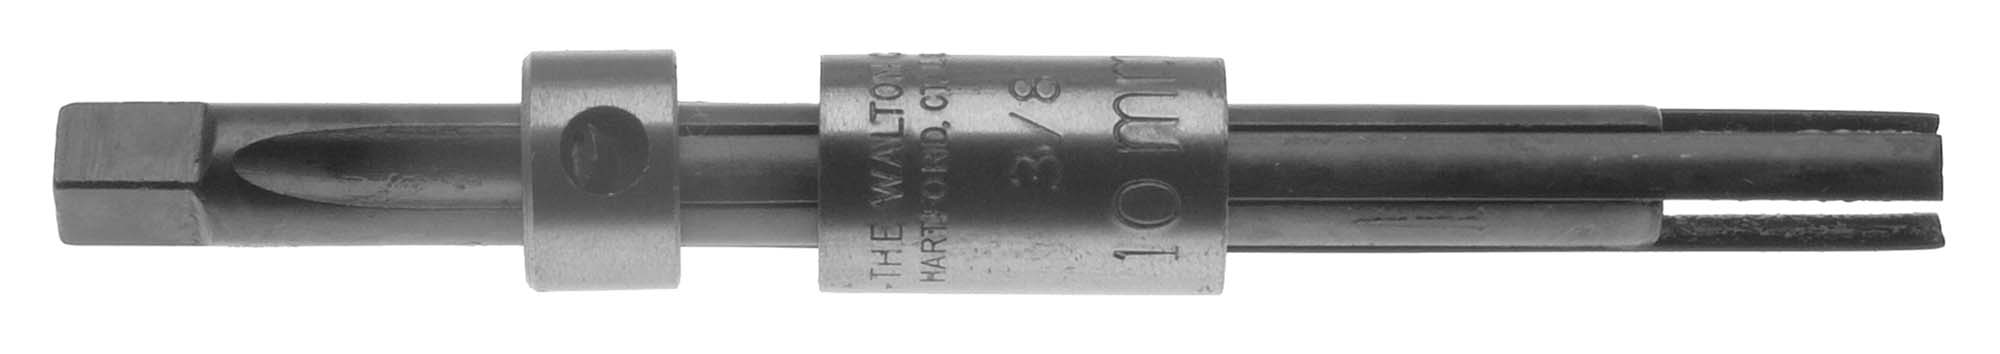 #6 3 Flute Walton Tap Extractor